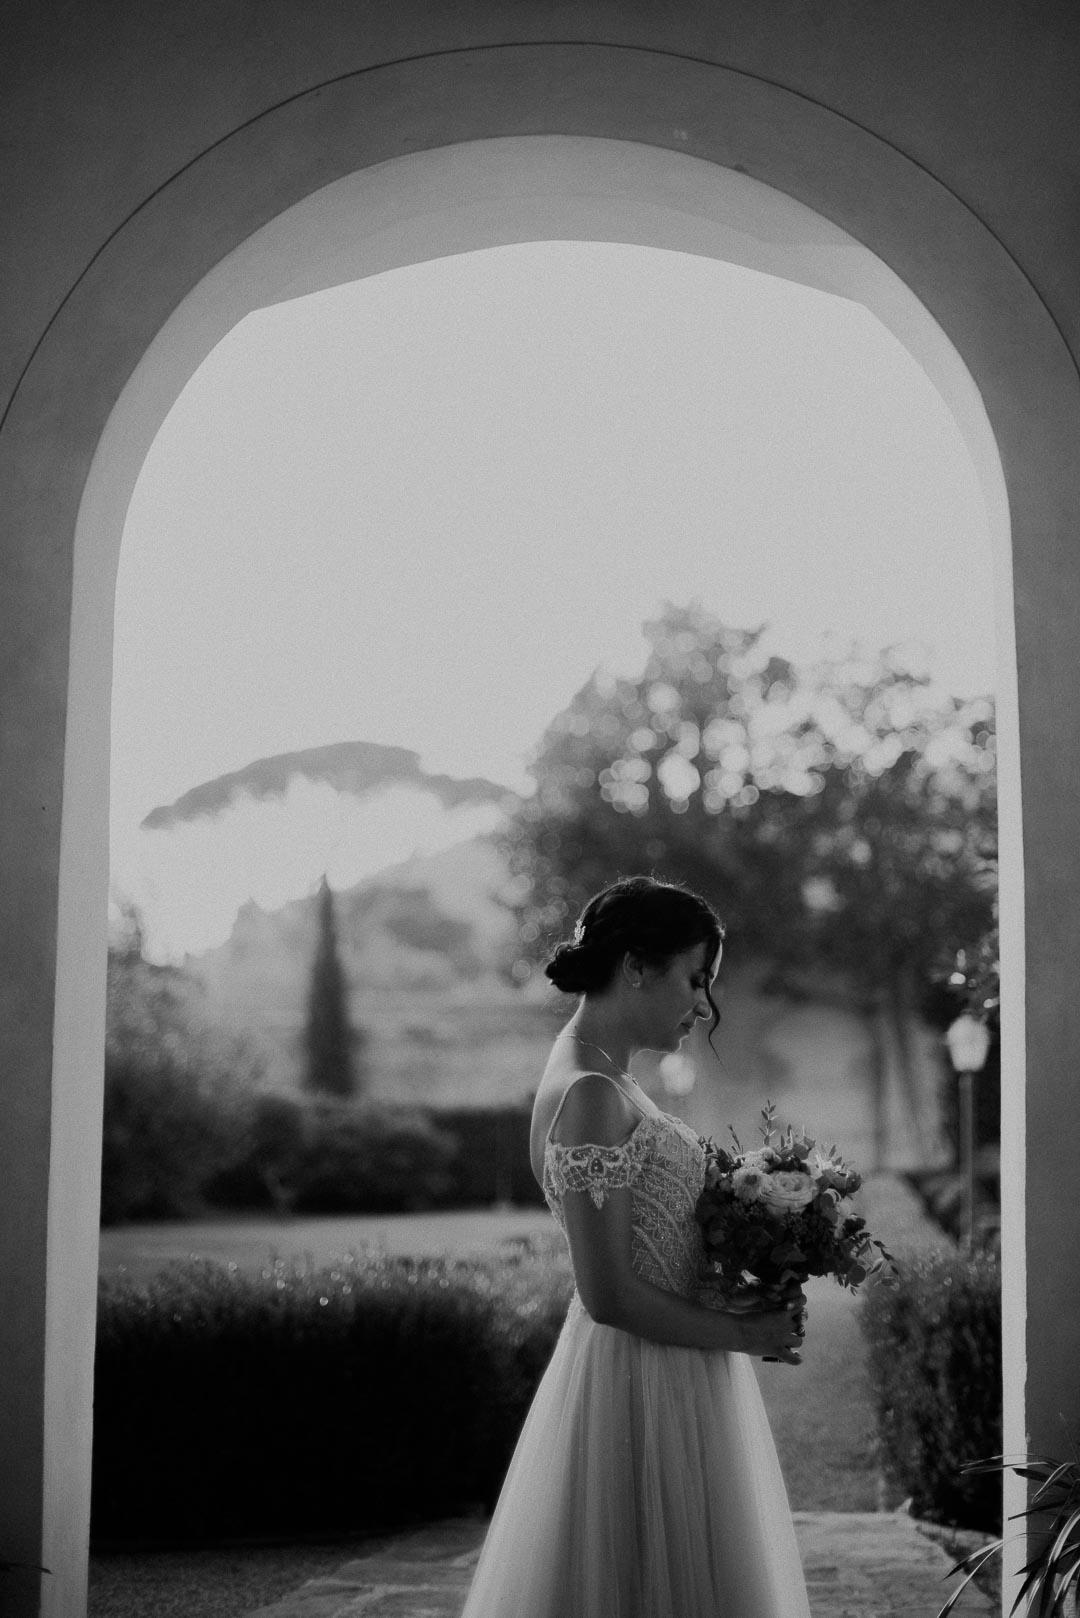 wedding-photographer-destination-fineart-bespoke-reportage-tuscany-villascorzi-vivianeizzo-spazio46-98